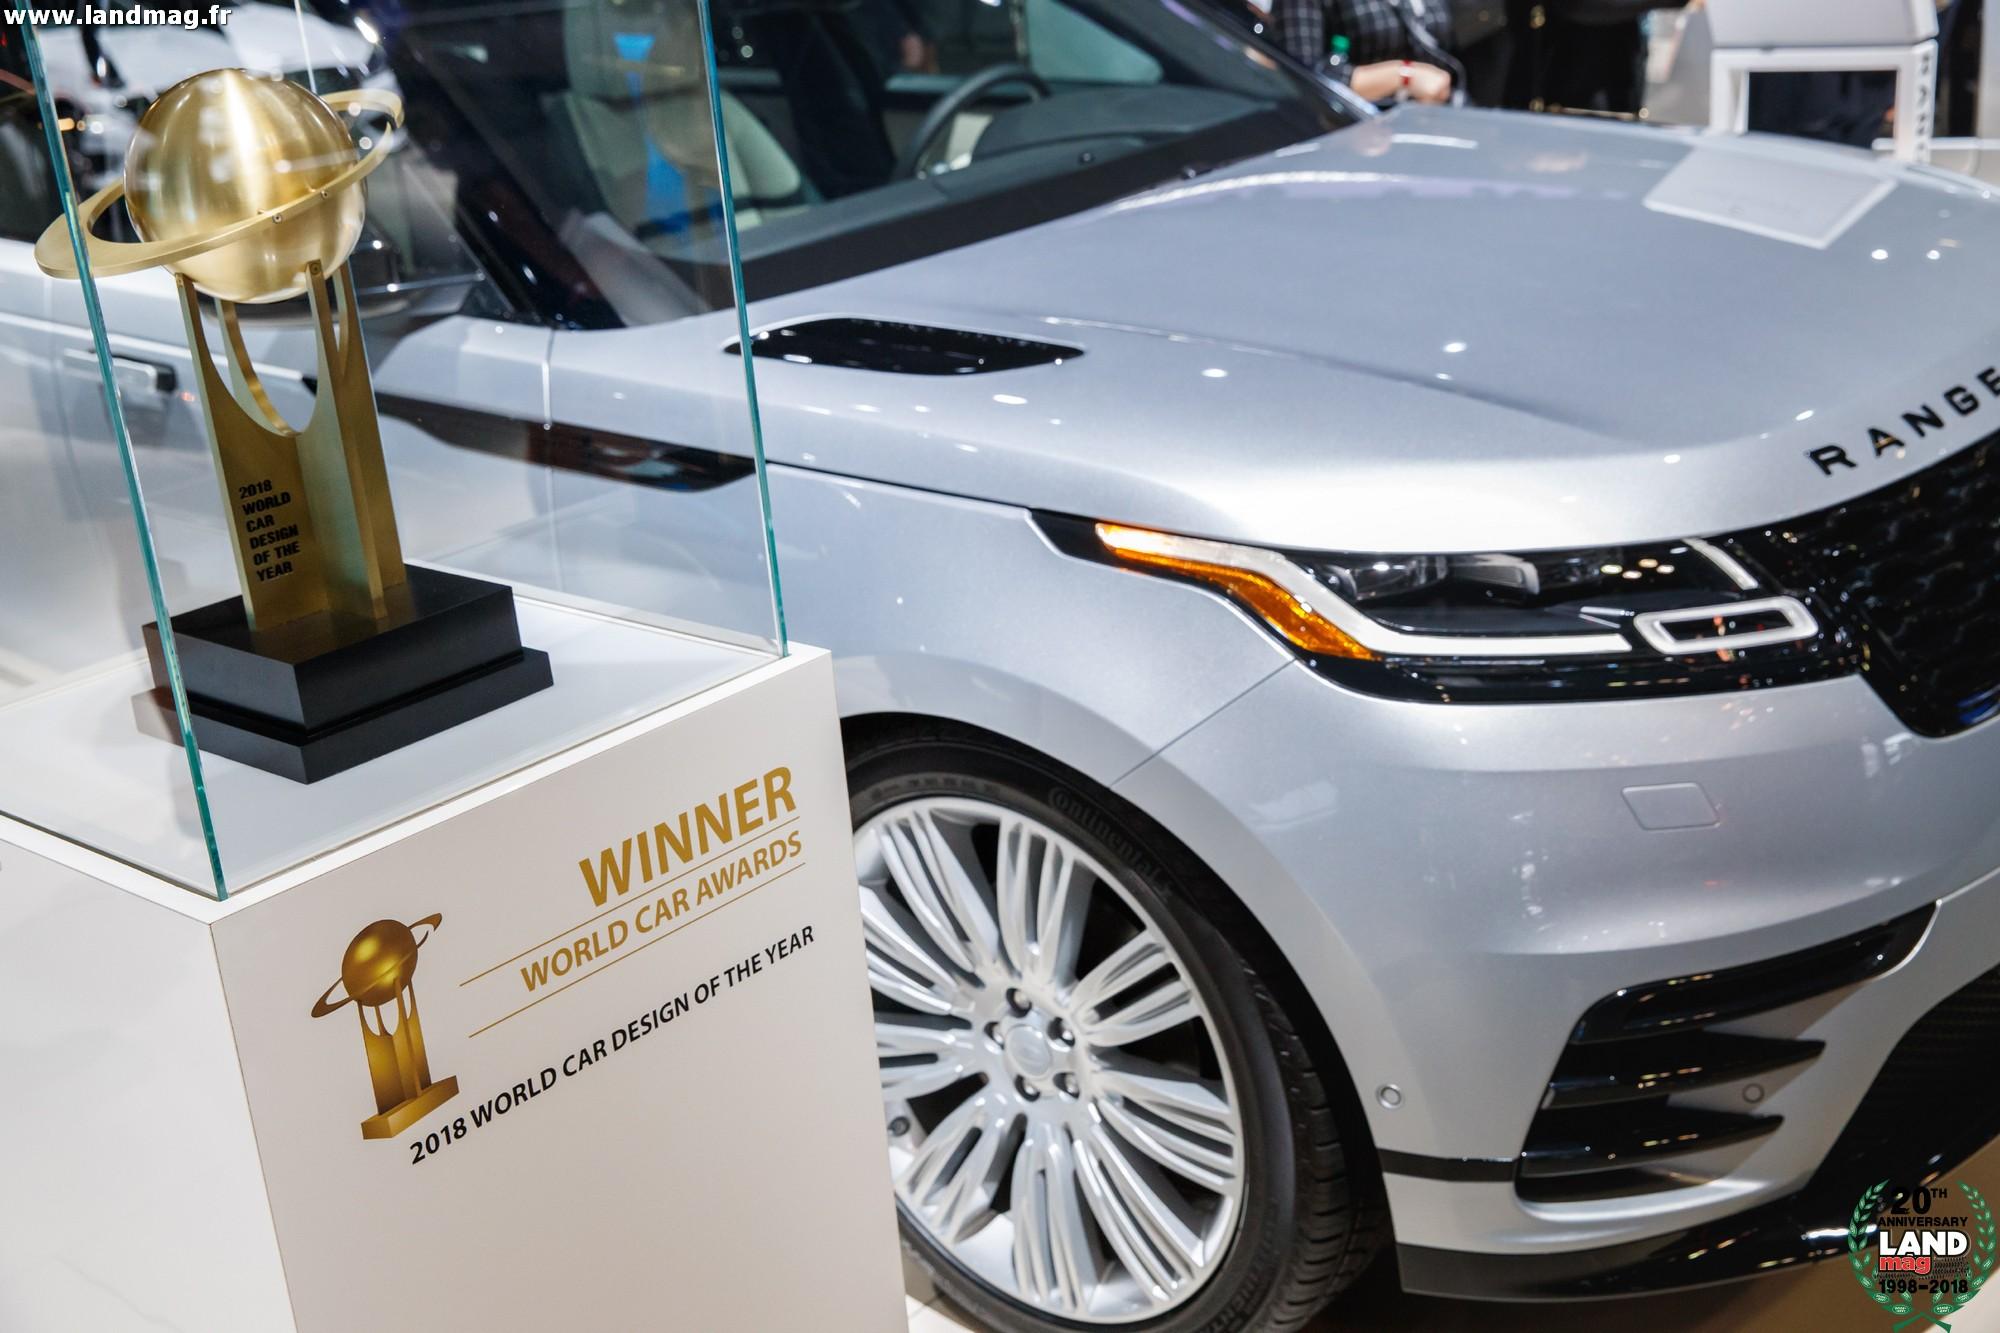 le range rover velar lu plus belle voiture du monde pour 2018. Black Bedroom Furniture Sets. Home Design Ideas